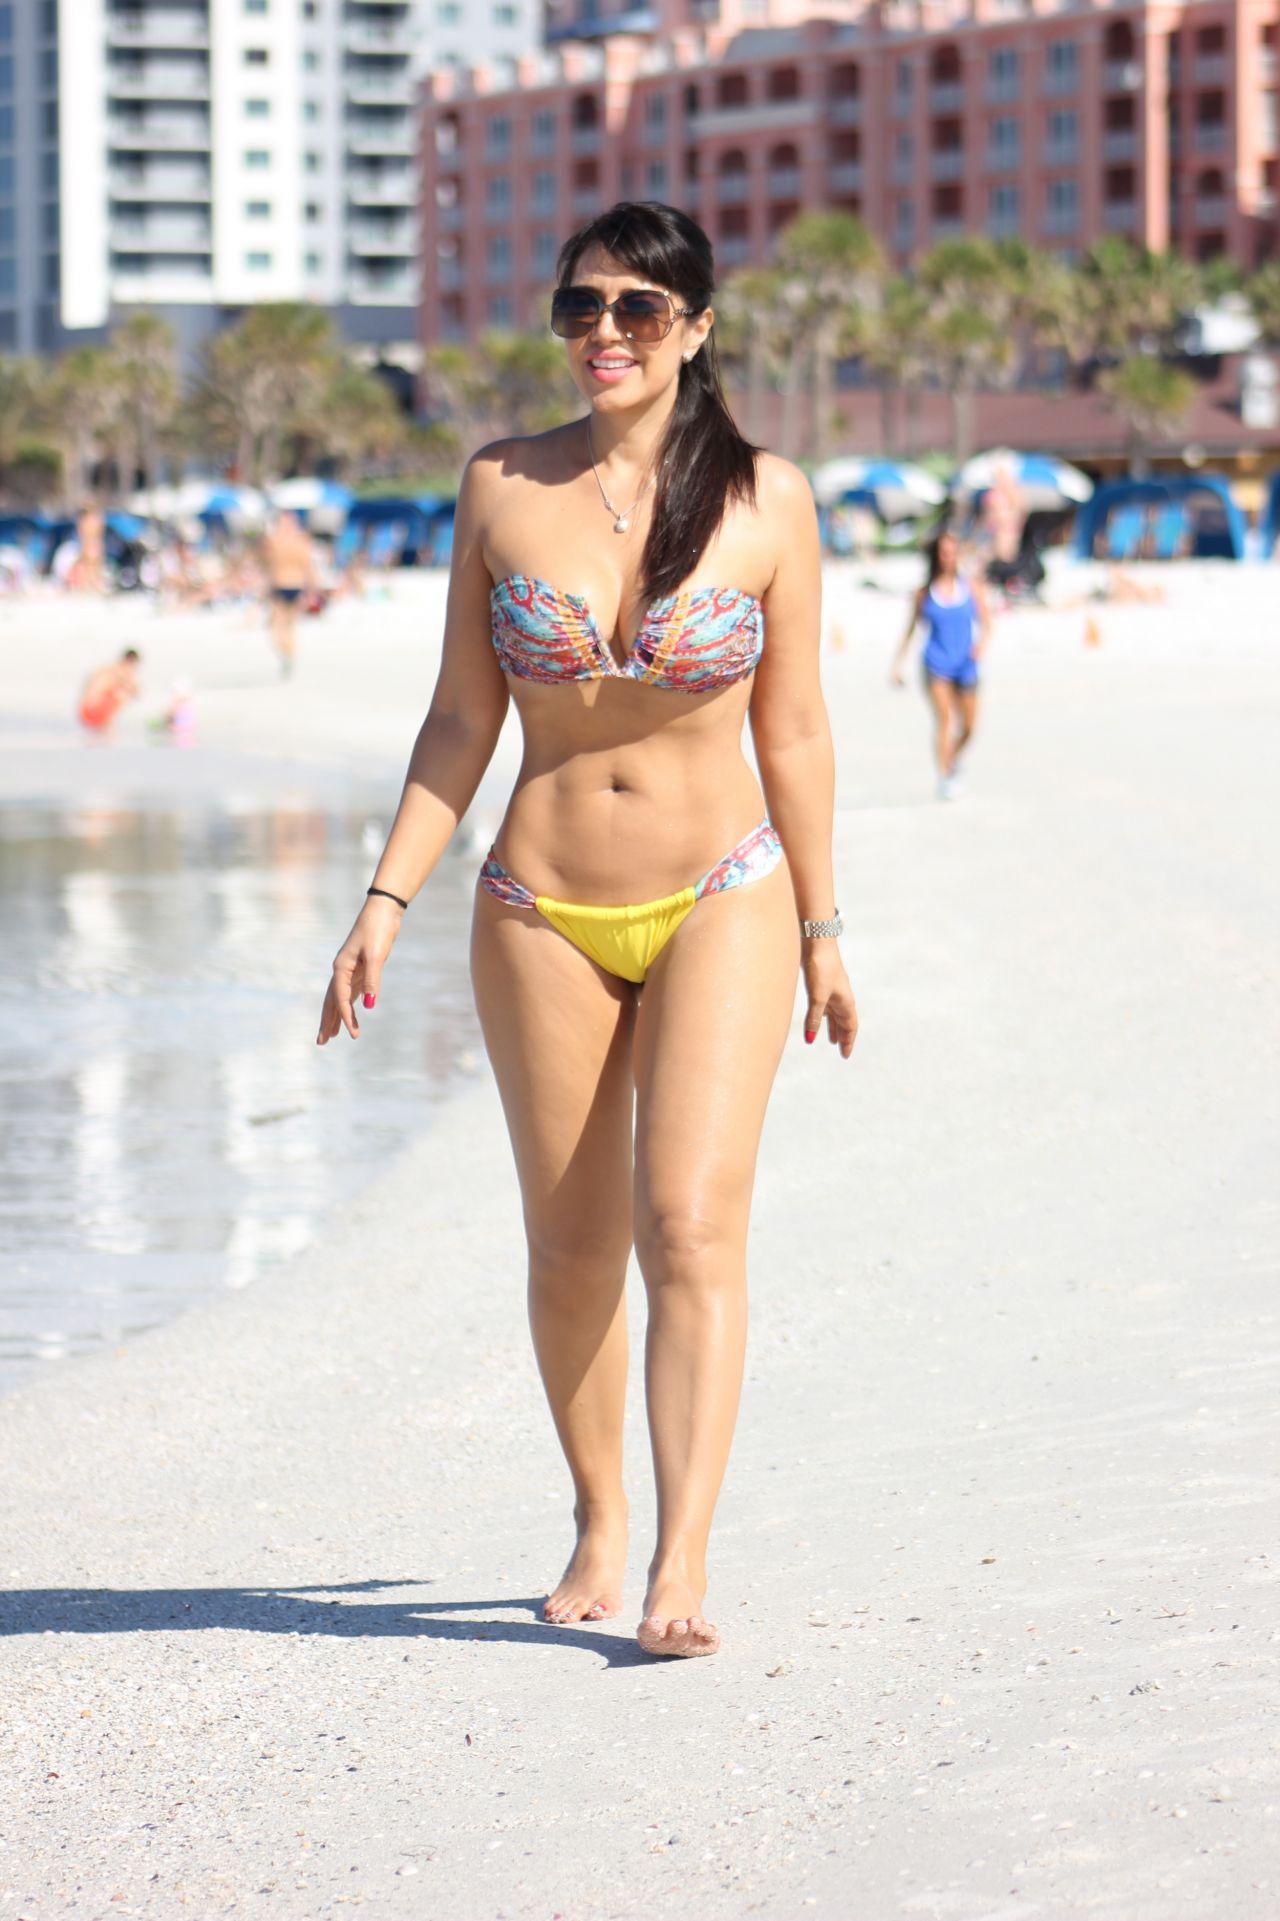 Paparazzi Bikini Molly Sims  naked (58 photo), Snapchat, legs